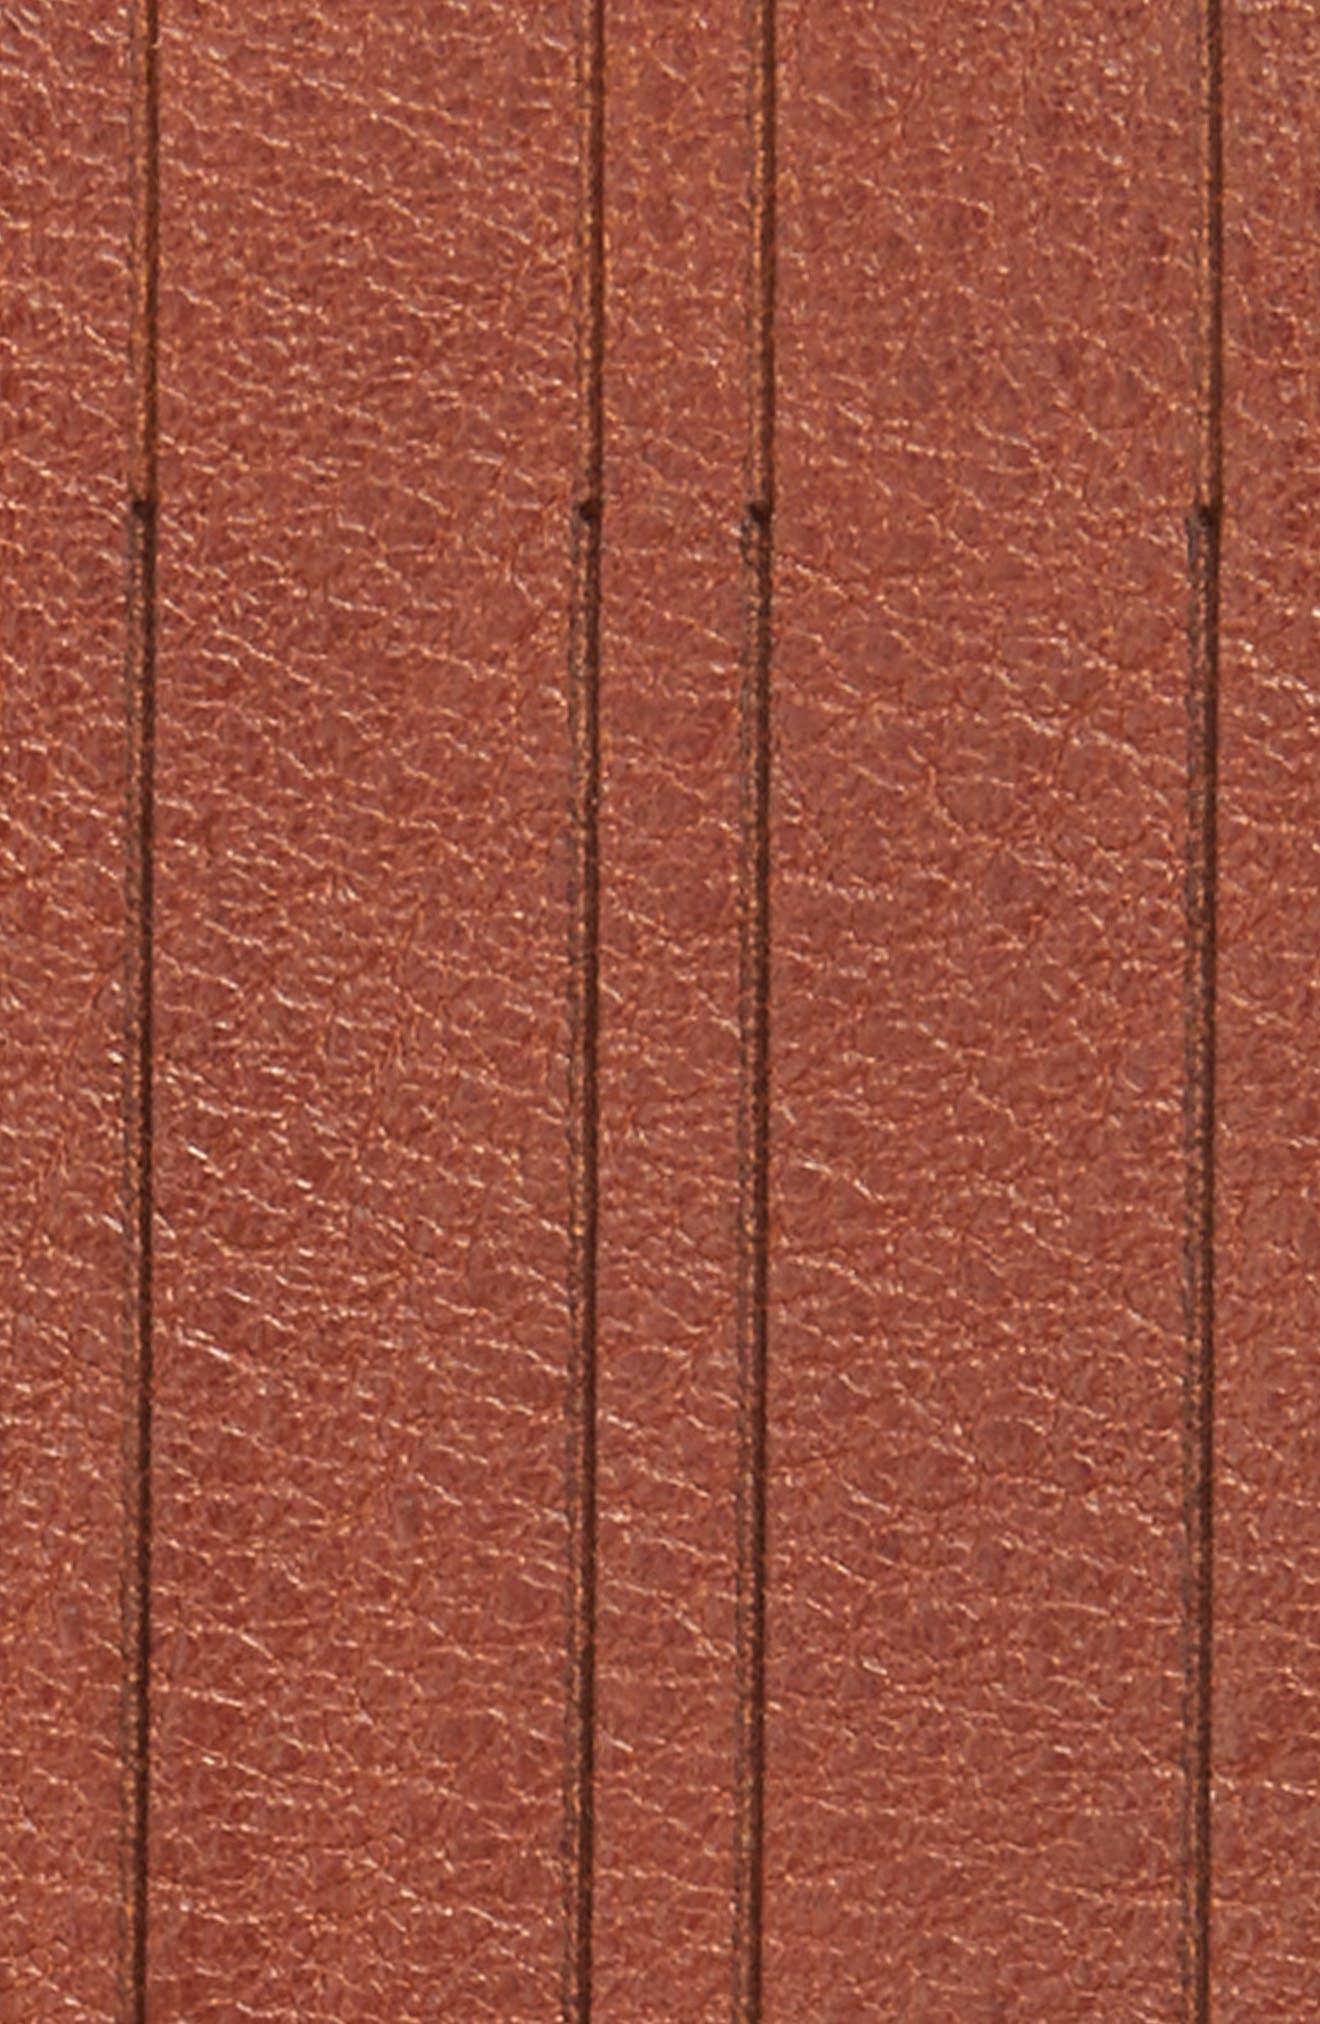 Magno Leather Belt,                             Alternate thumbnail 2, color,                             Tan